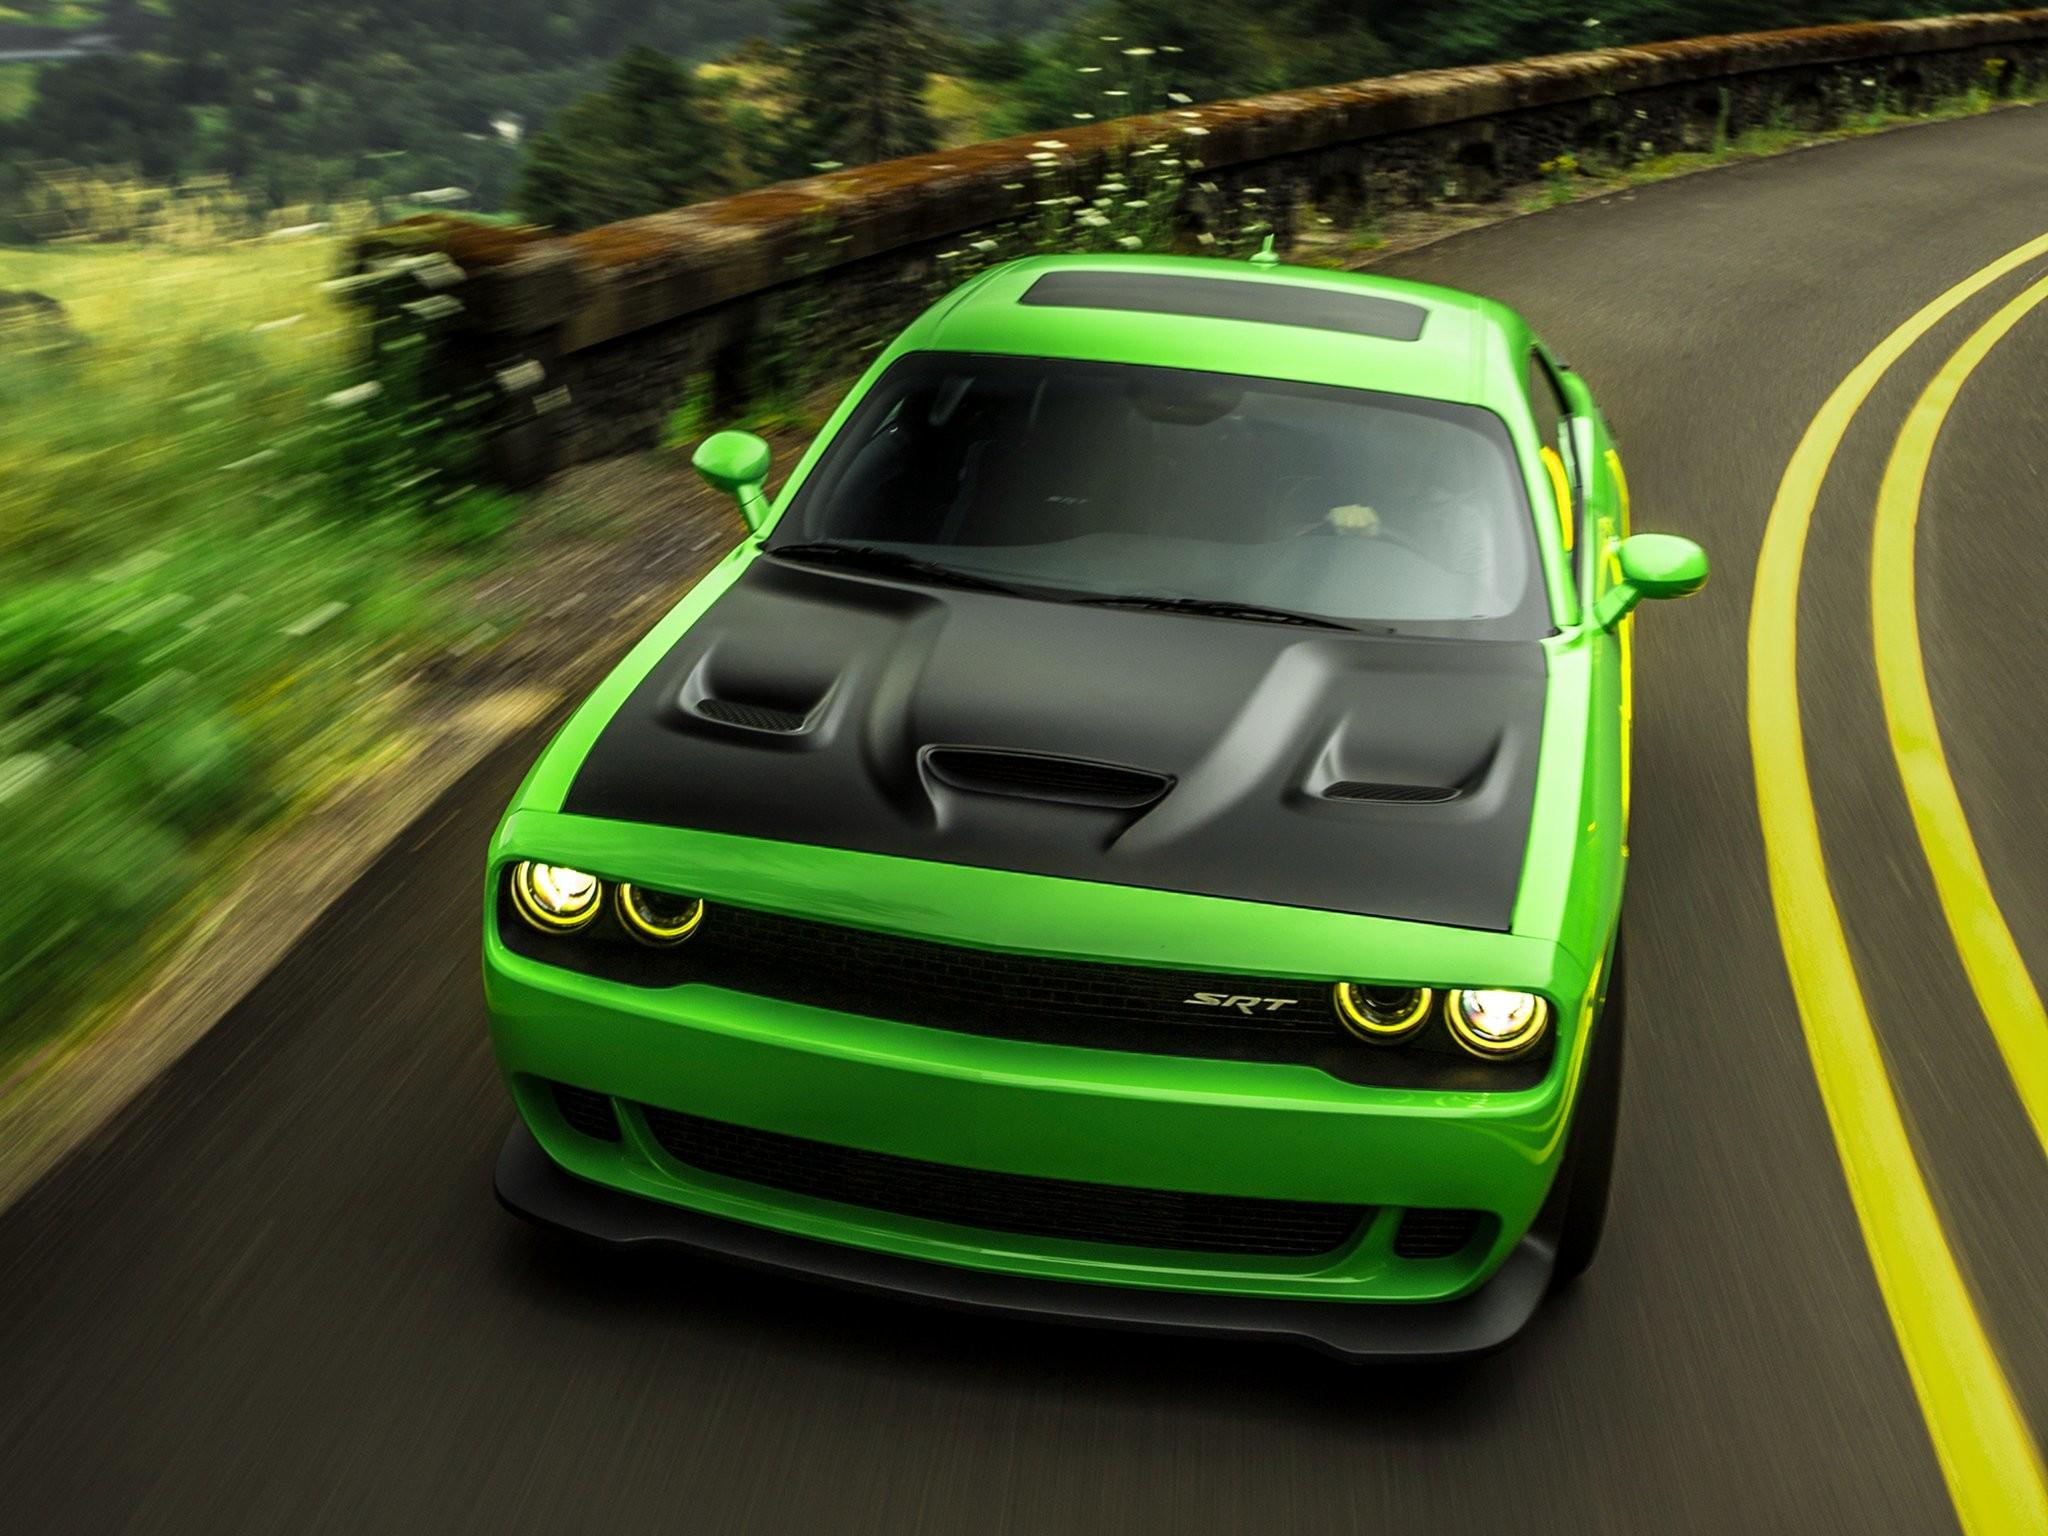 2015 Dodge Challenger Srt Hellcat Wallpaper